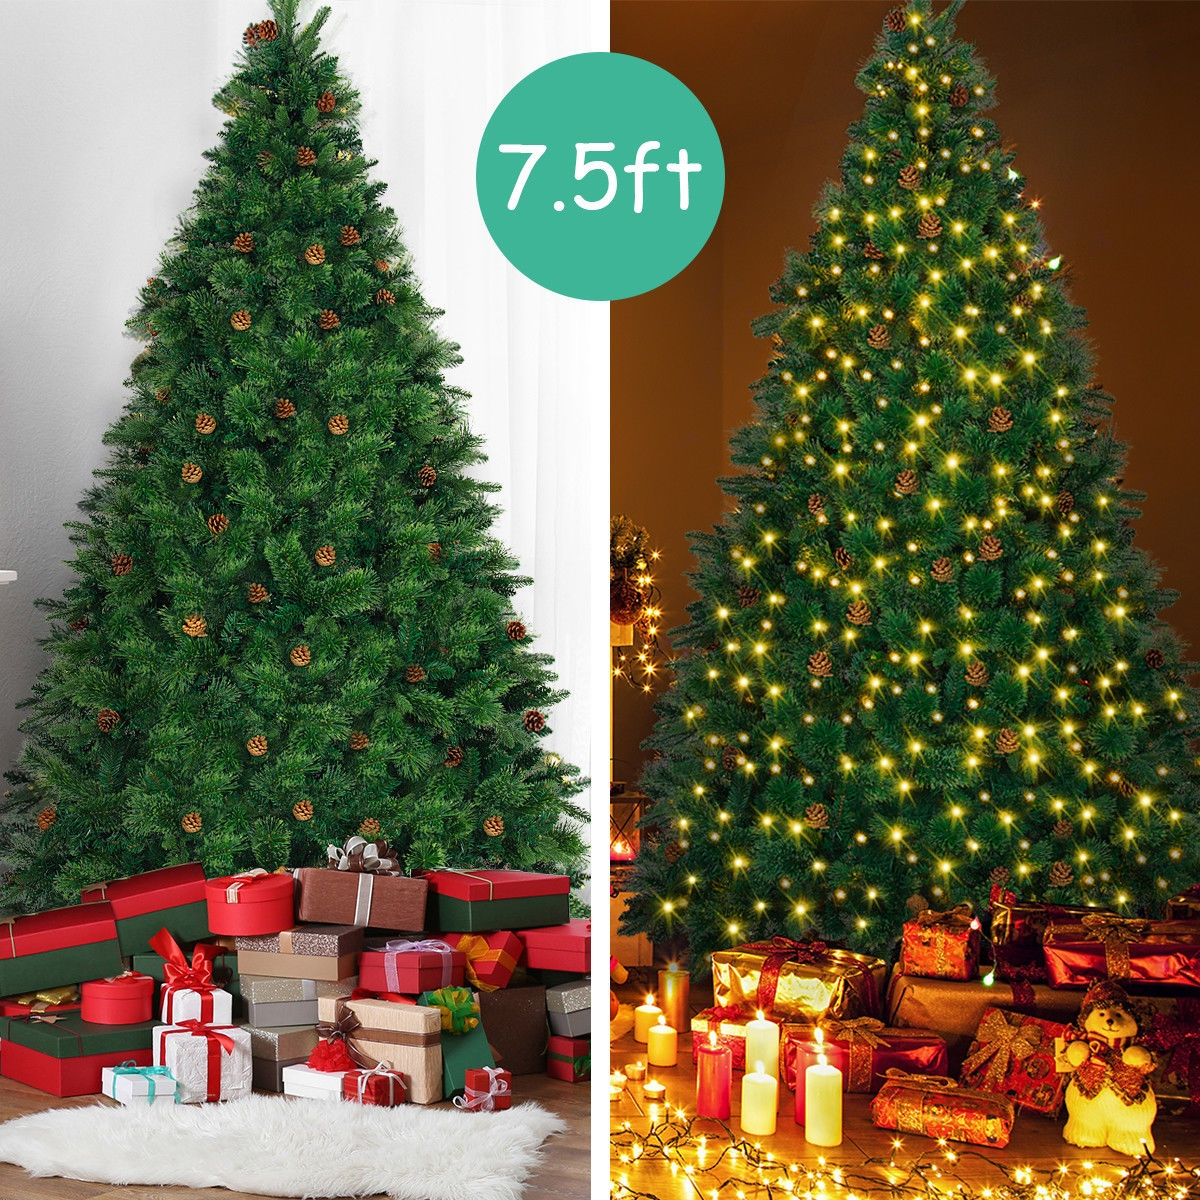 7.5ft Pre-lit Artificial 750 LED Hinged Lights Christmas Tree